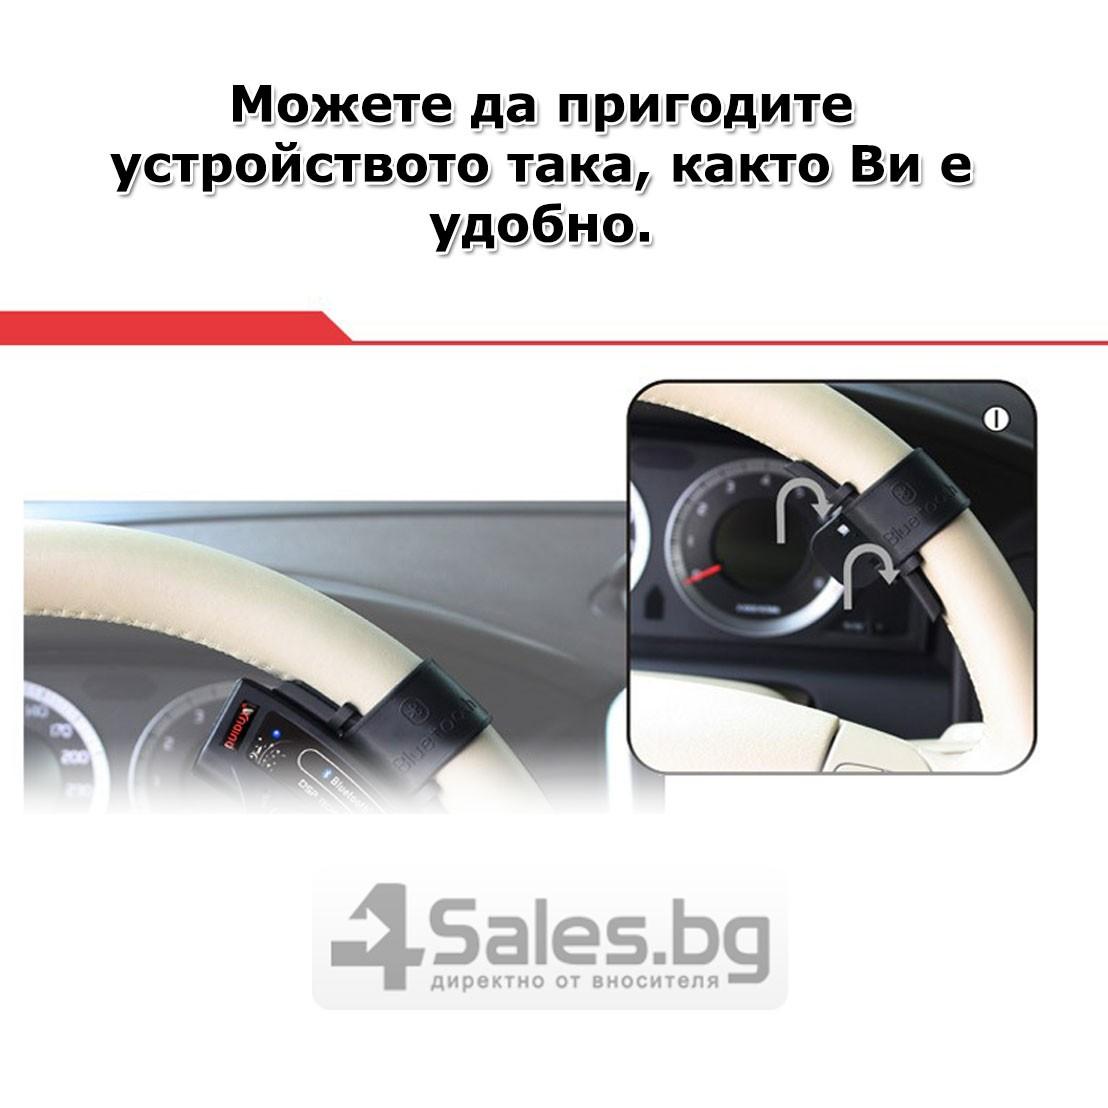 Bluetooth handsfree свободни ръце за волан на автомобил с високоговорител HF1 18